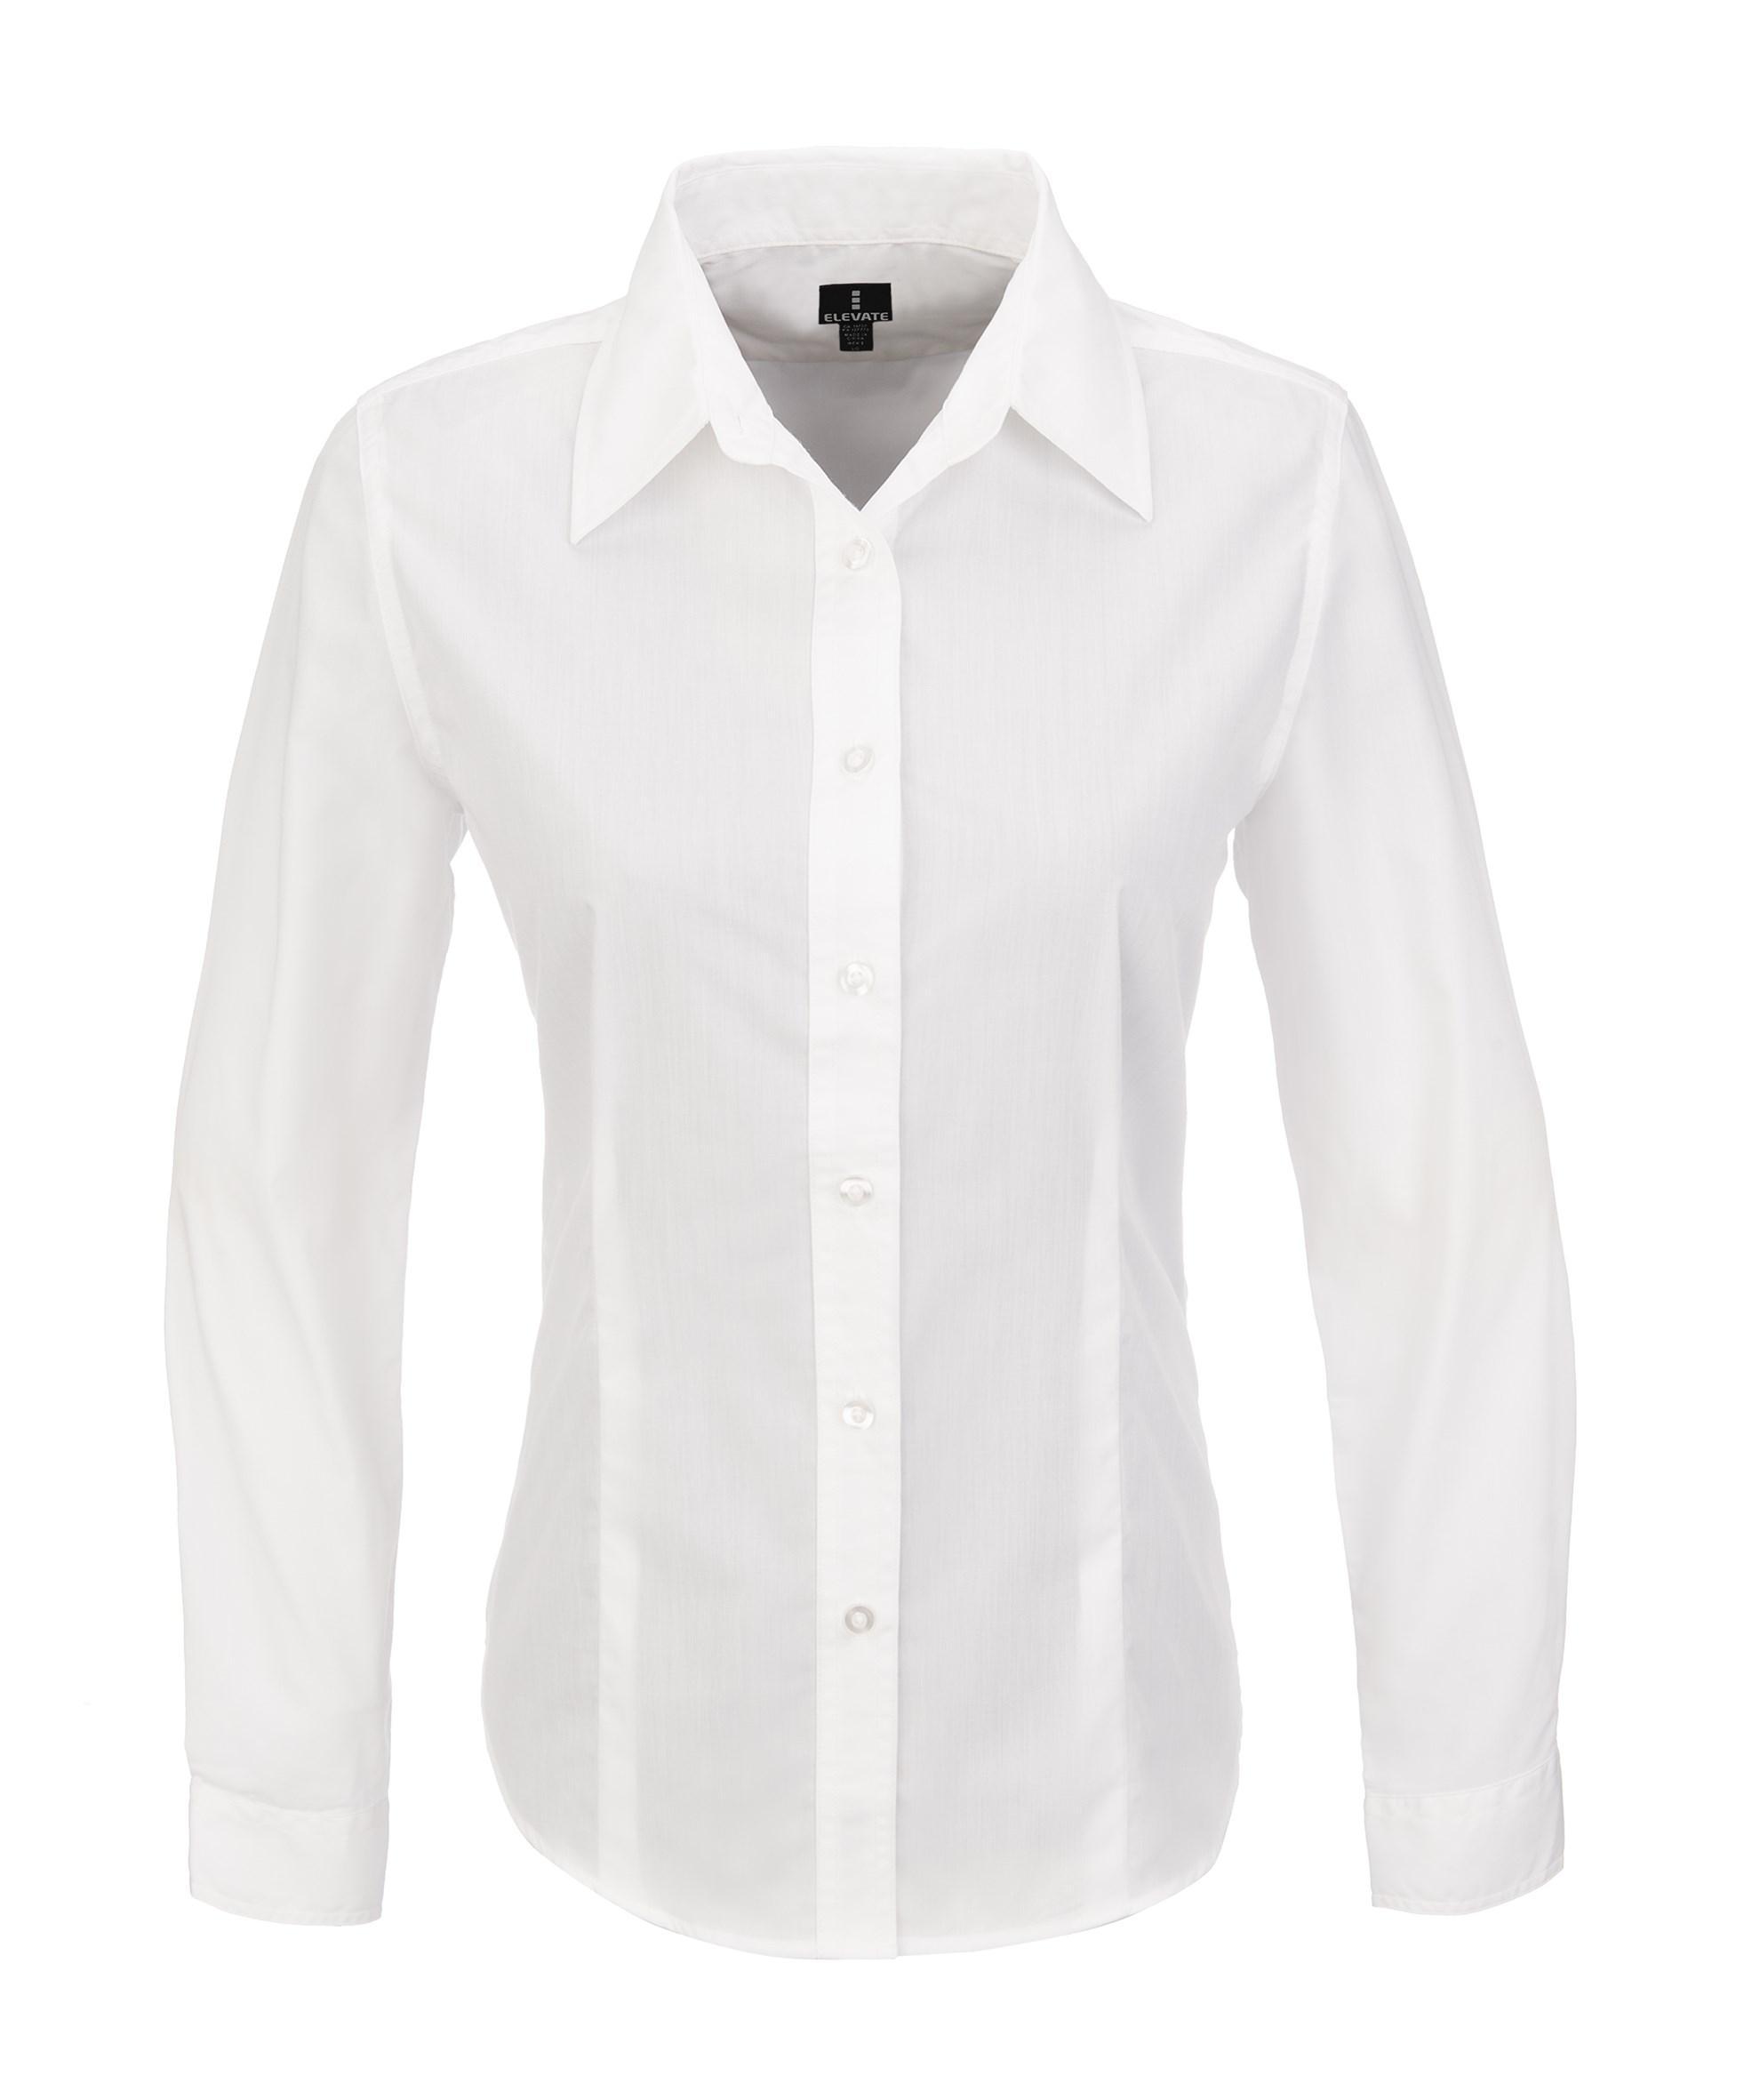 Ladies Long Sleeve Preston Shirt -white Only